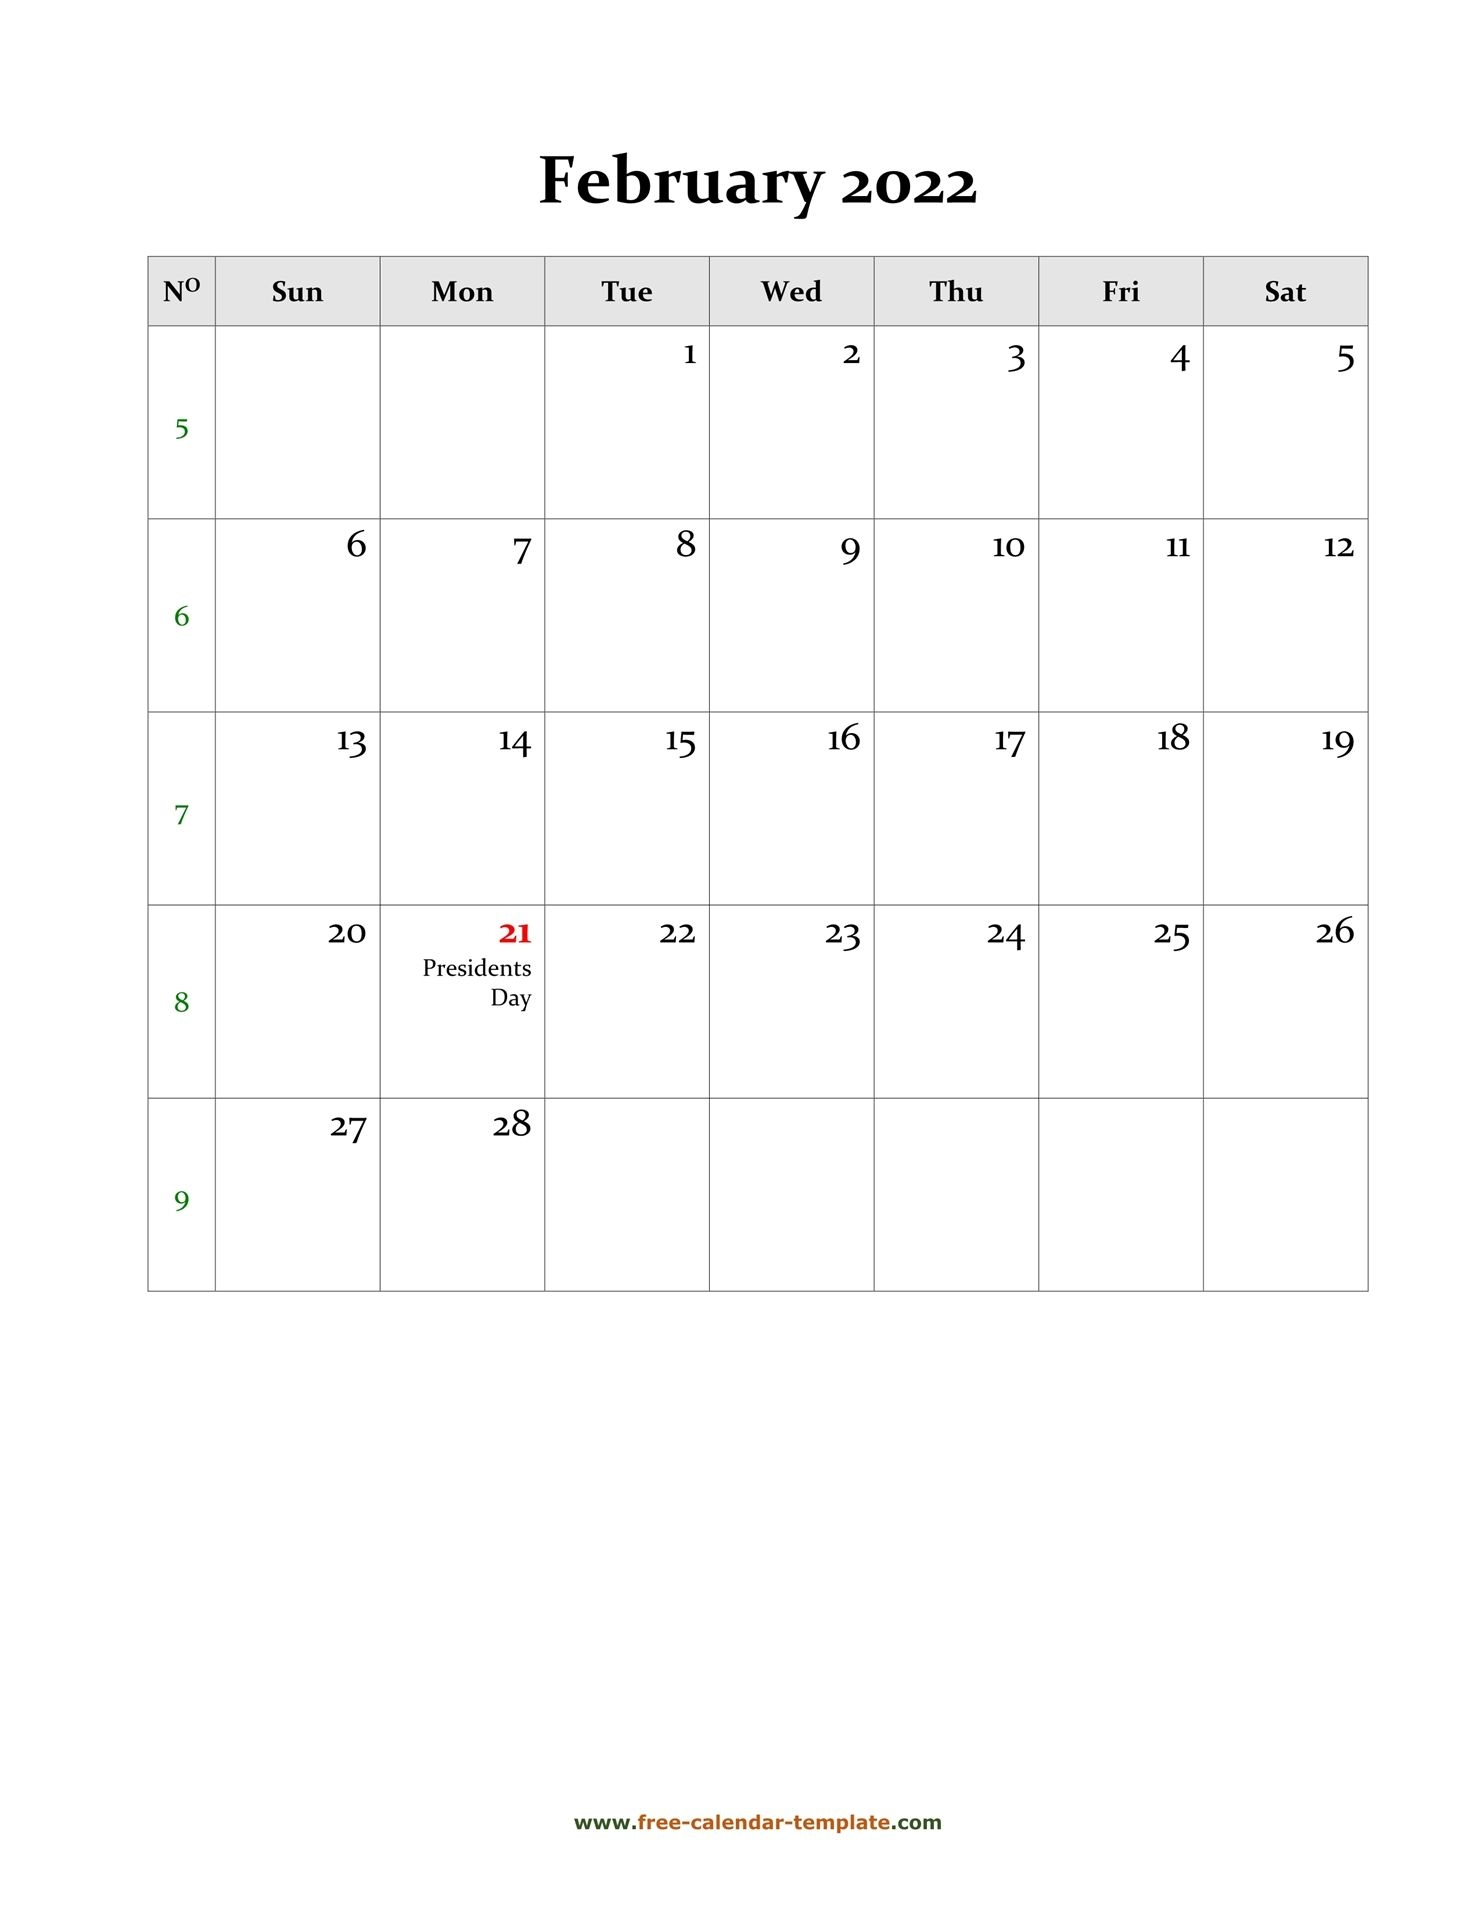 2022 February Calendar (Blank Vertical Template) | Free